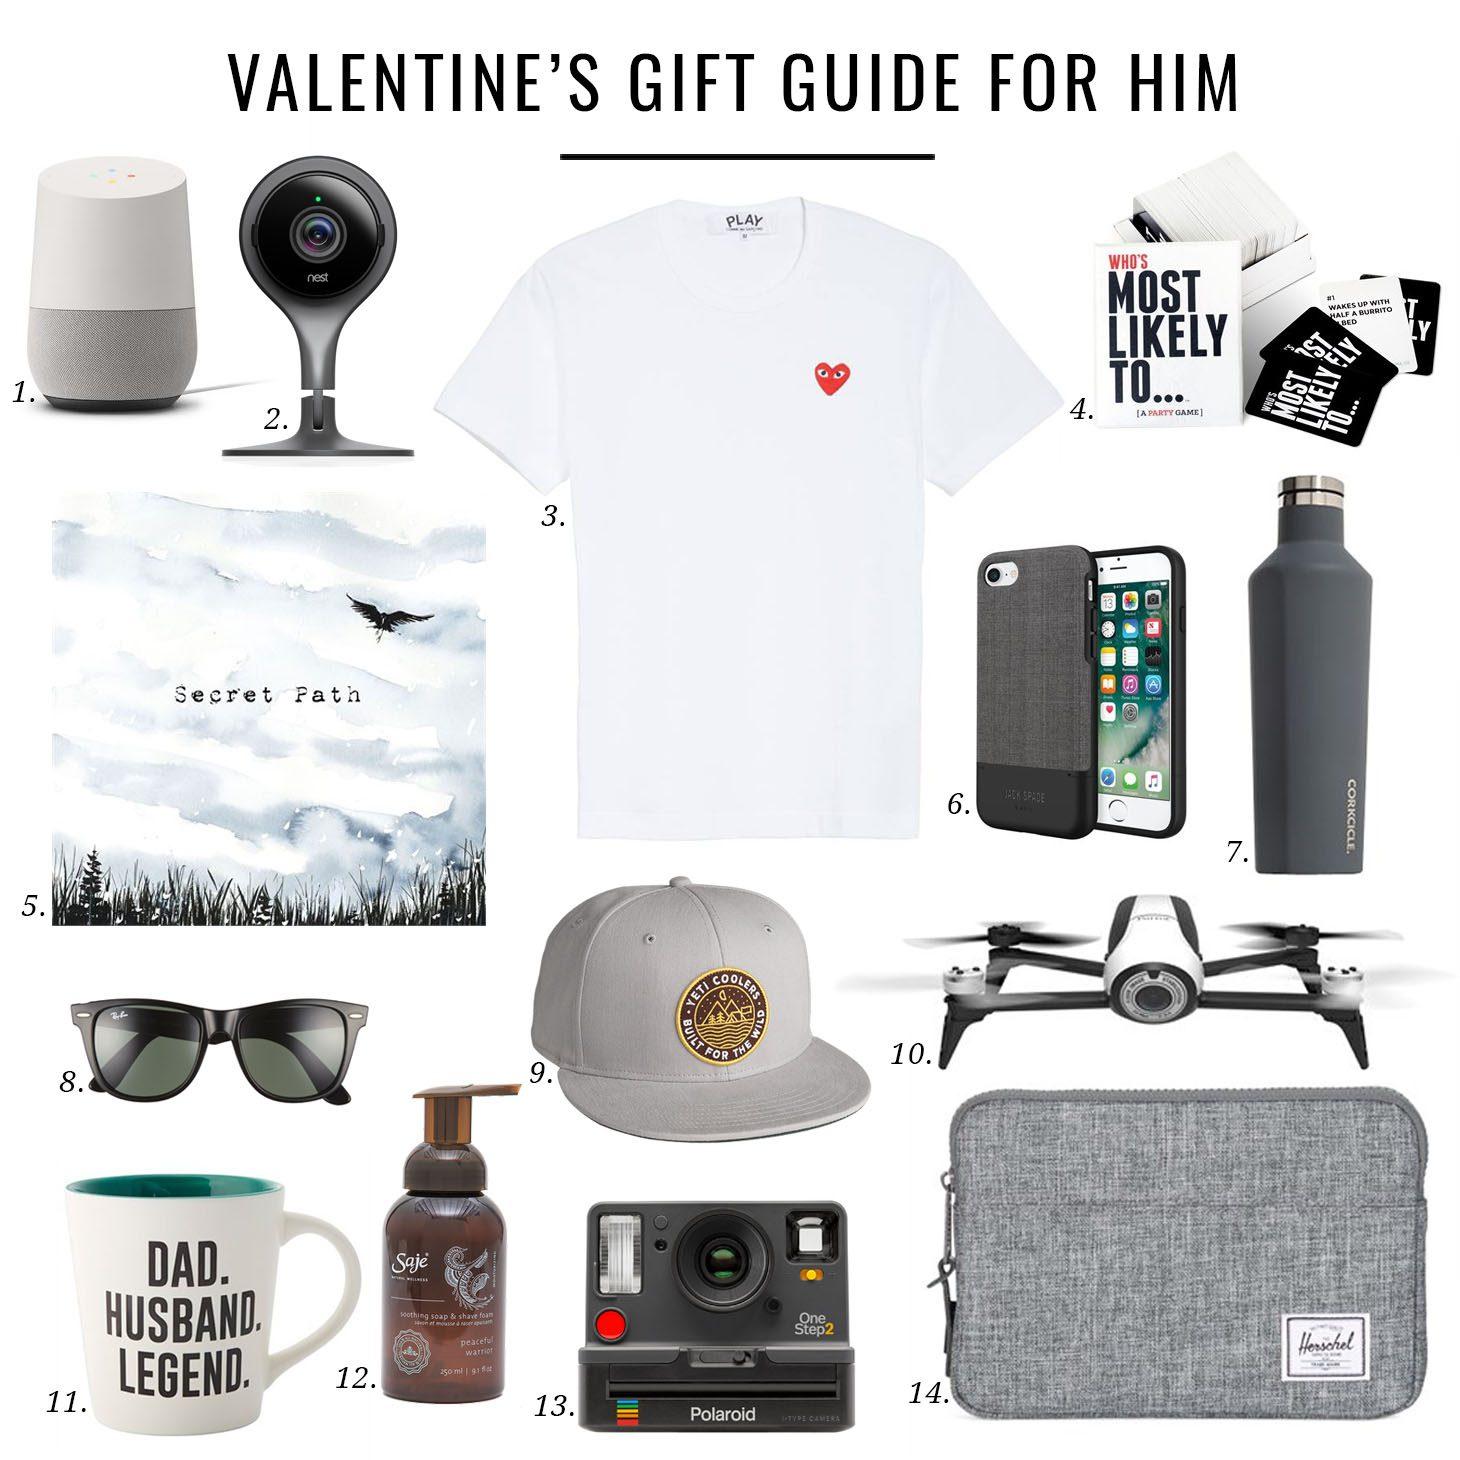 Jillian Harris Valentine's Day for Him